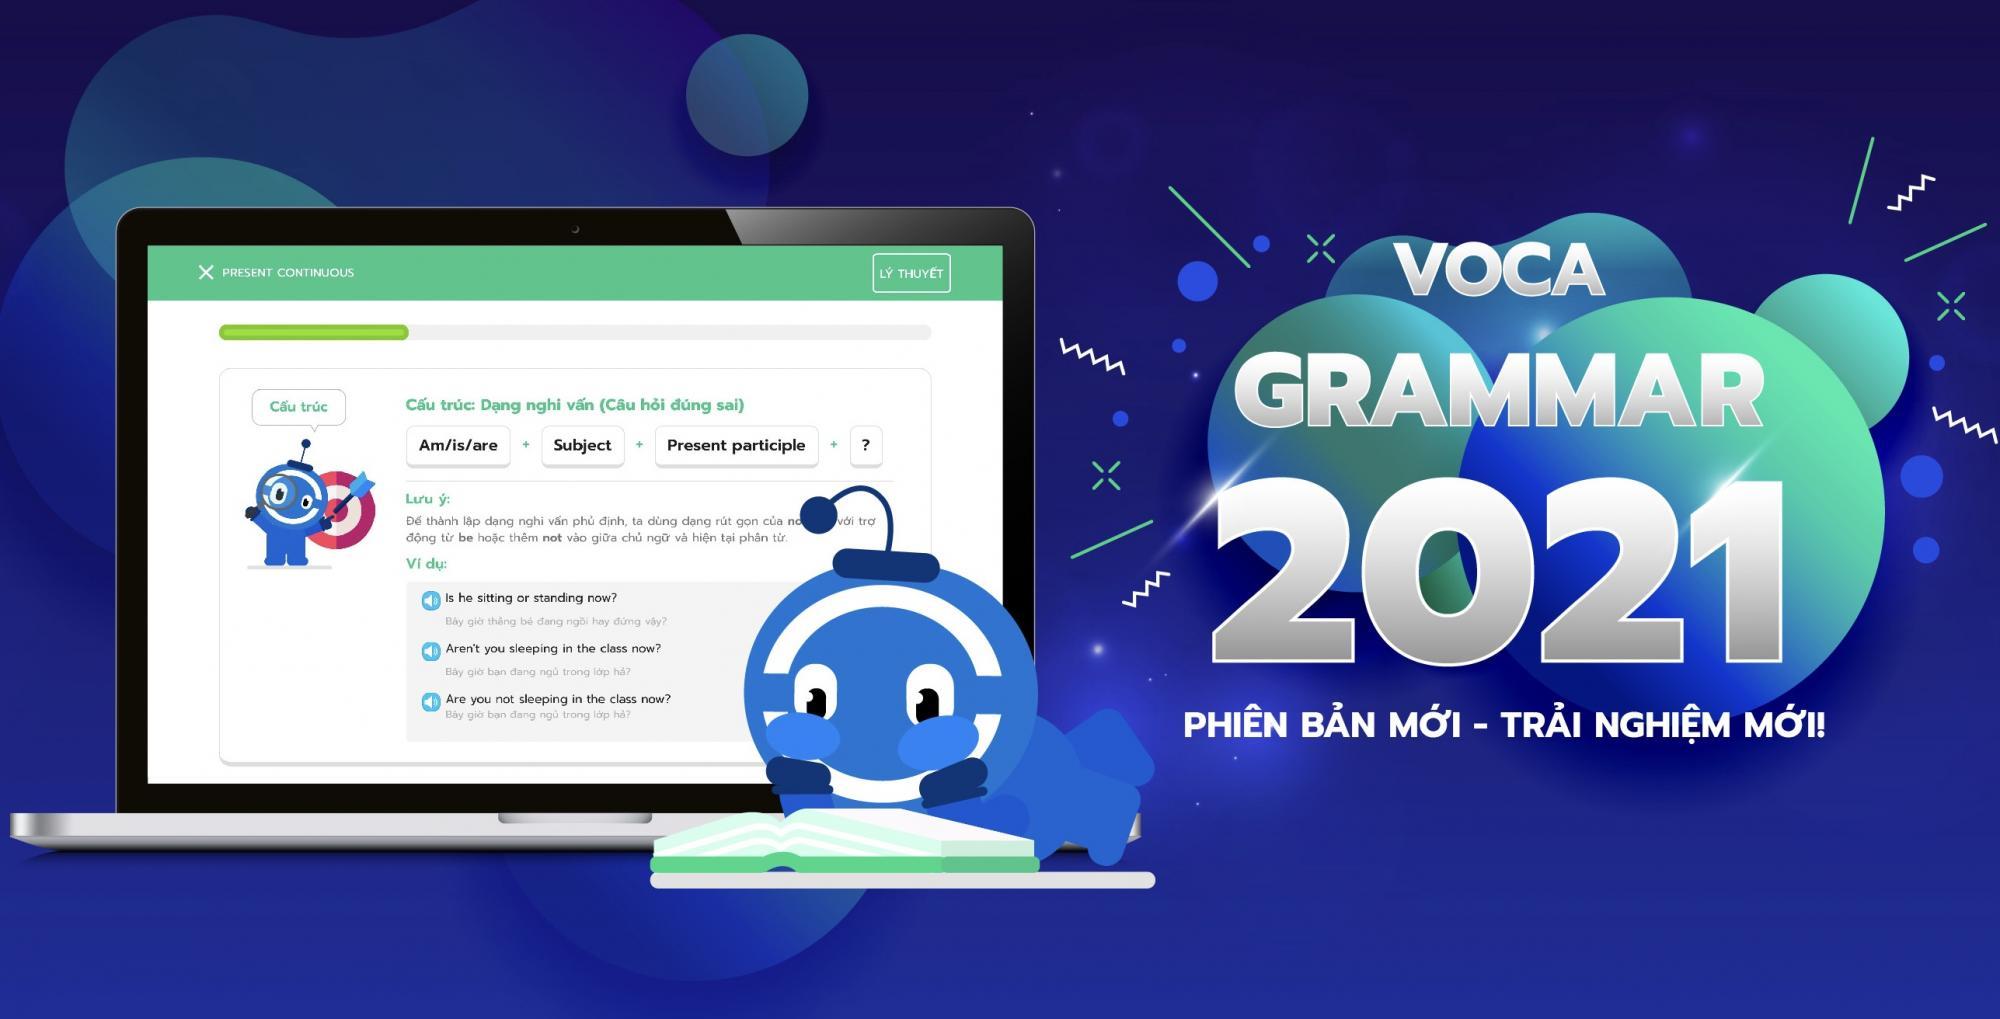 VOCA grammar